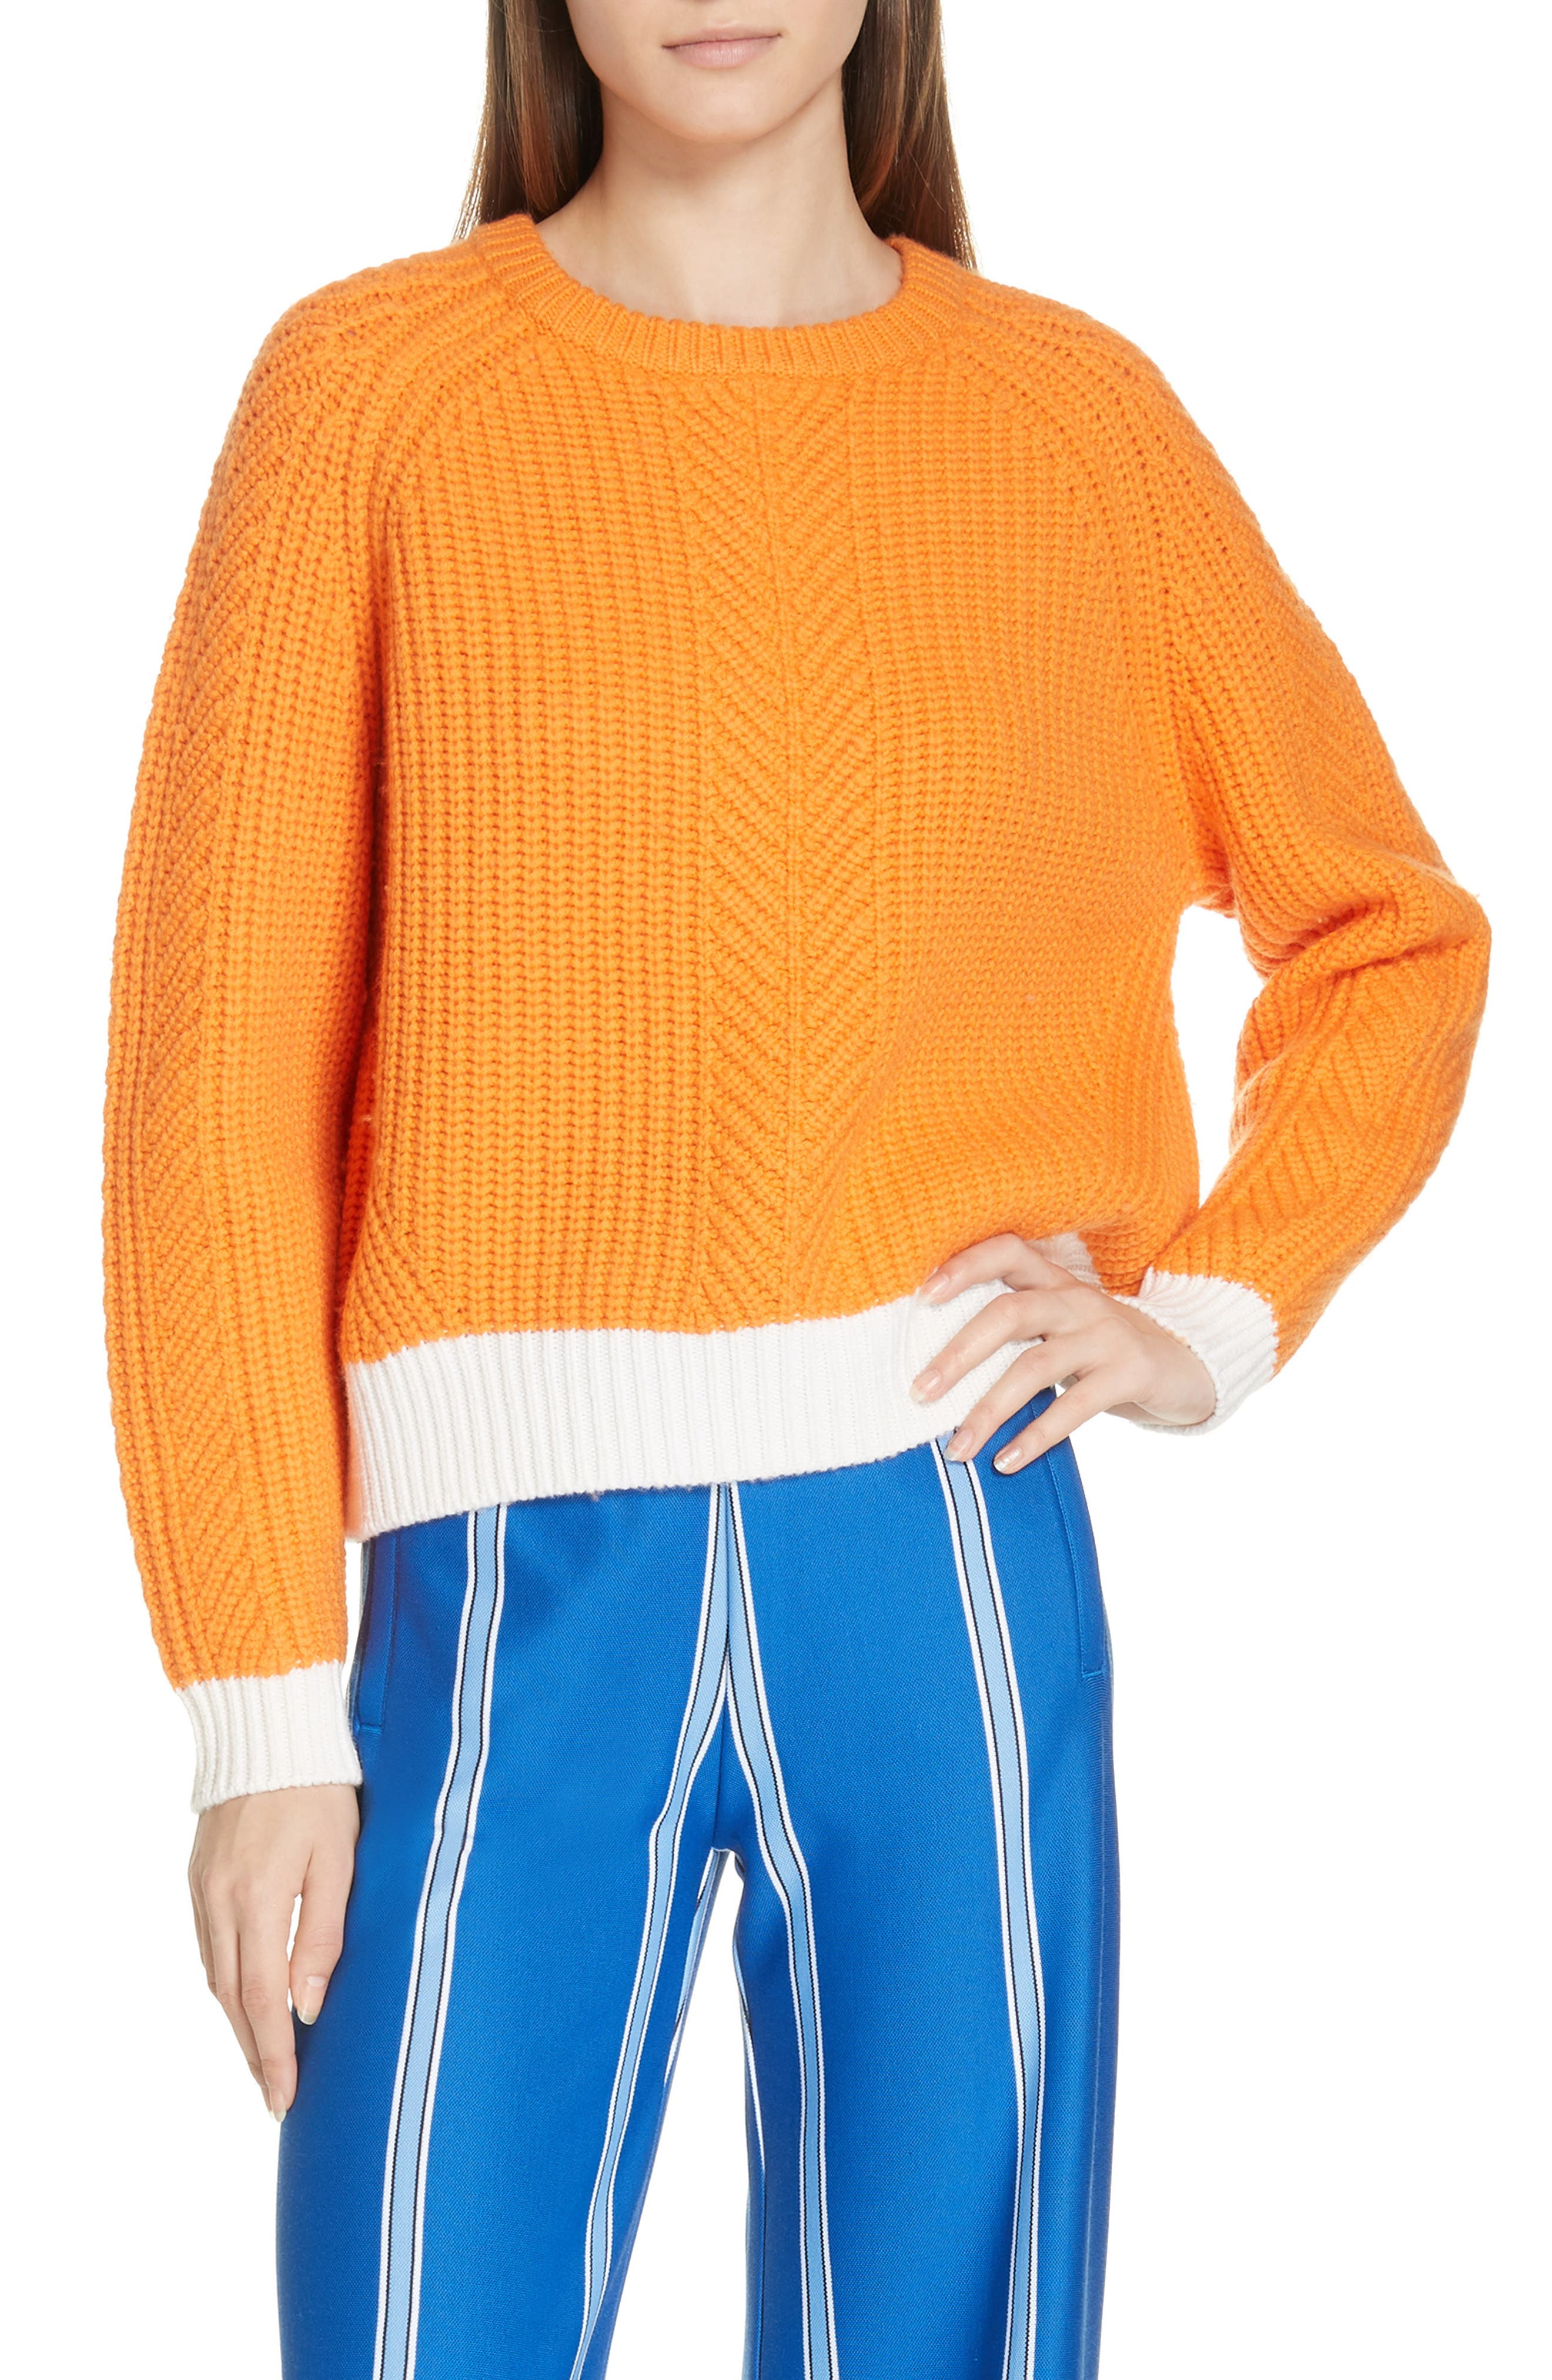 Tory Sport Contrast Hem Merino Wool Sweater, Orange